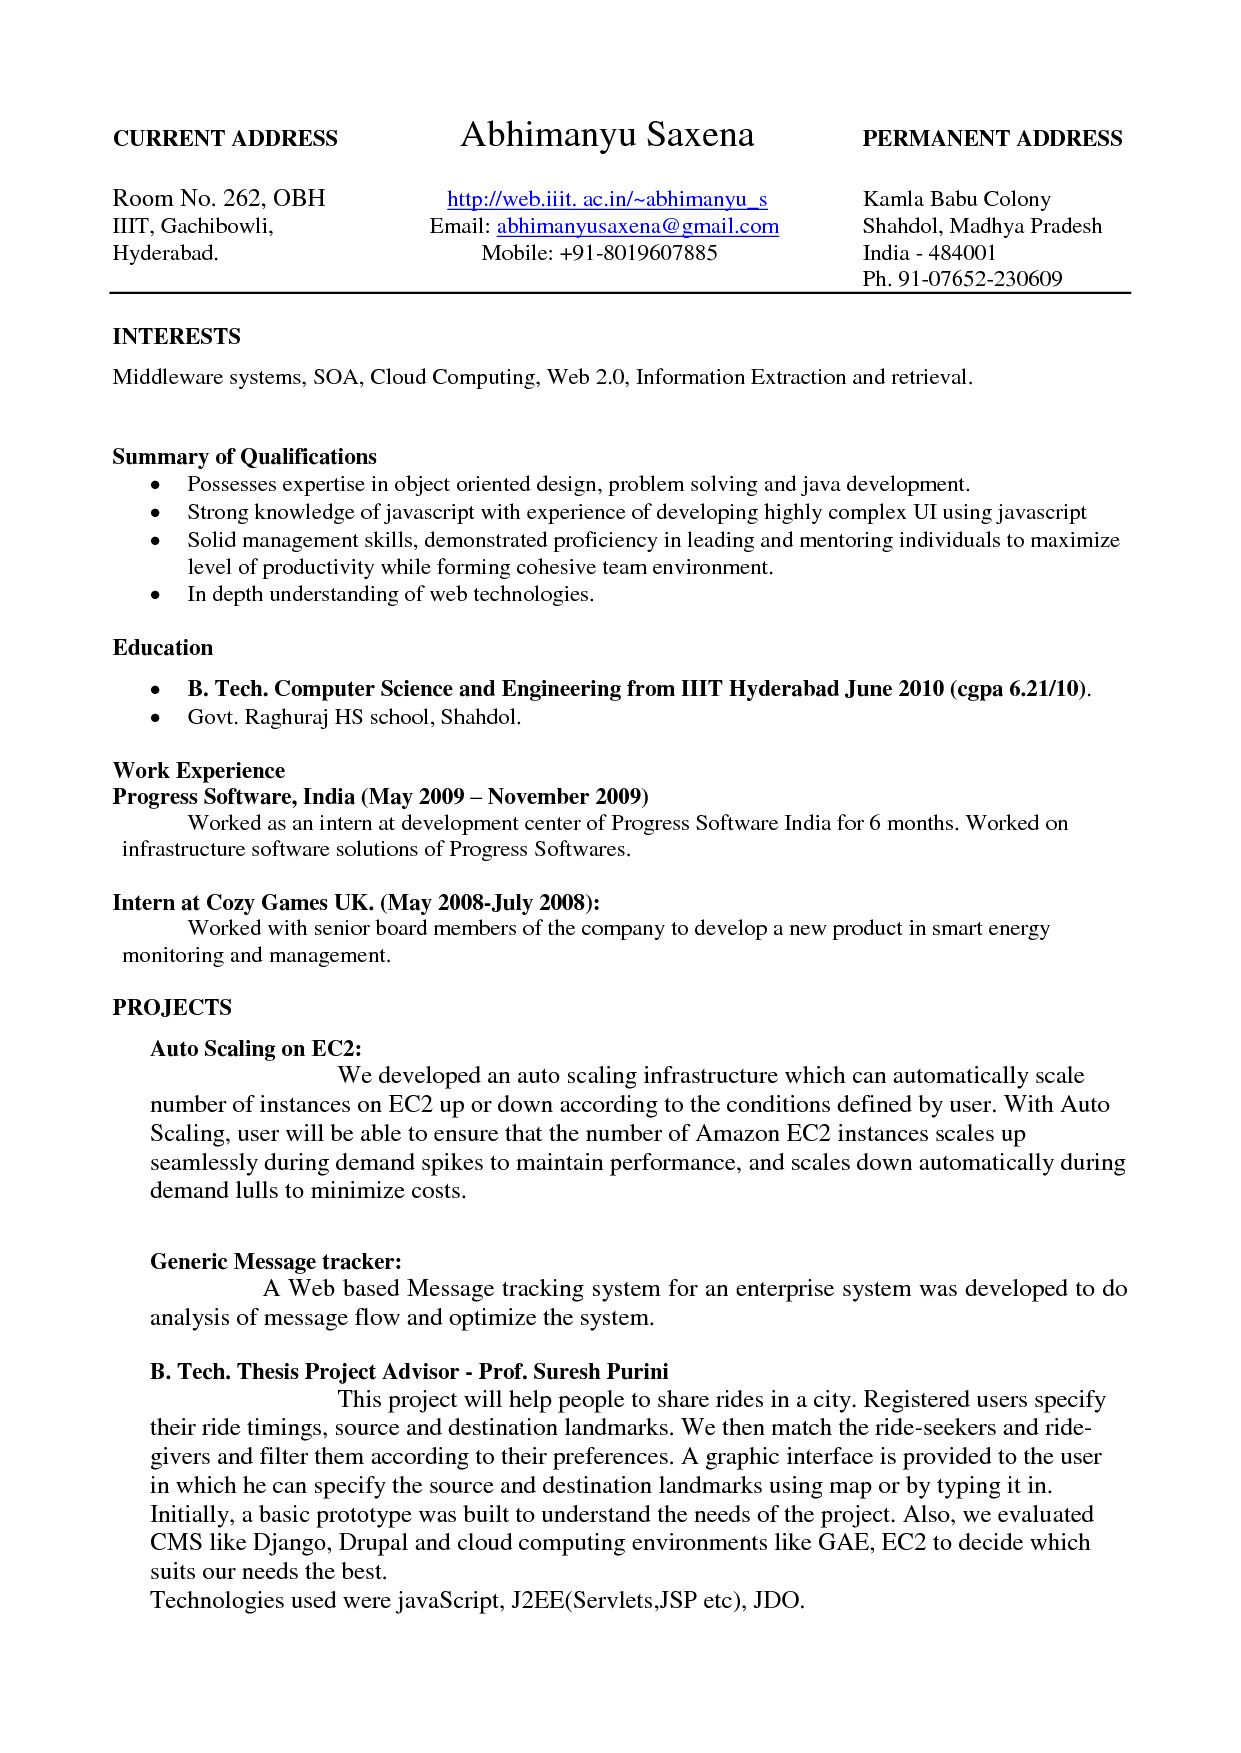 Resume Template Google Docs High School